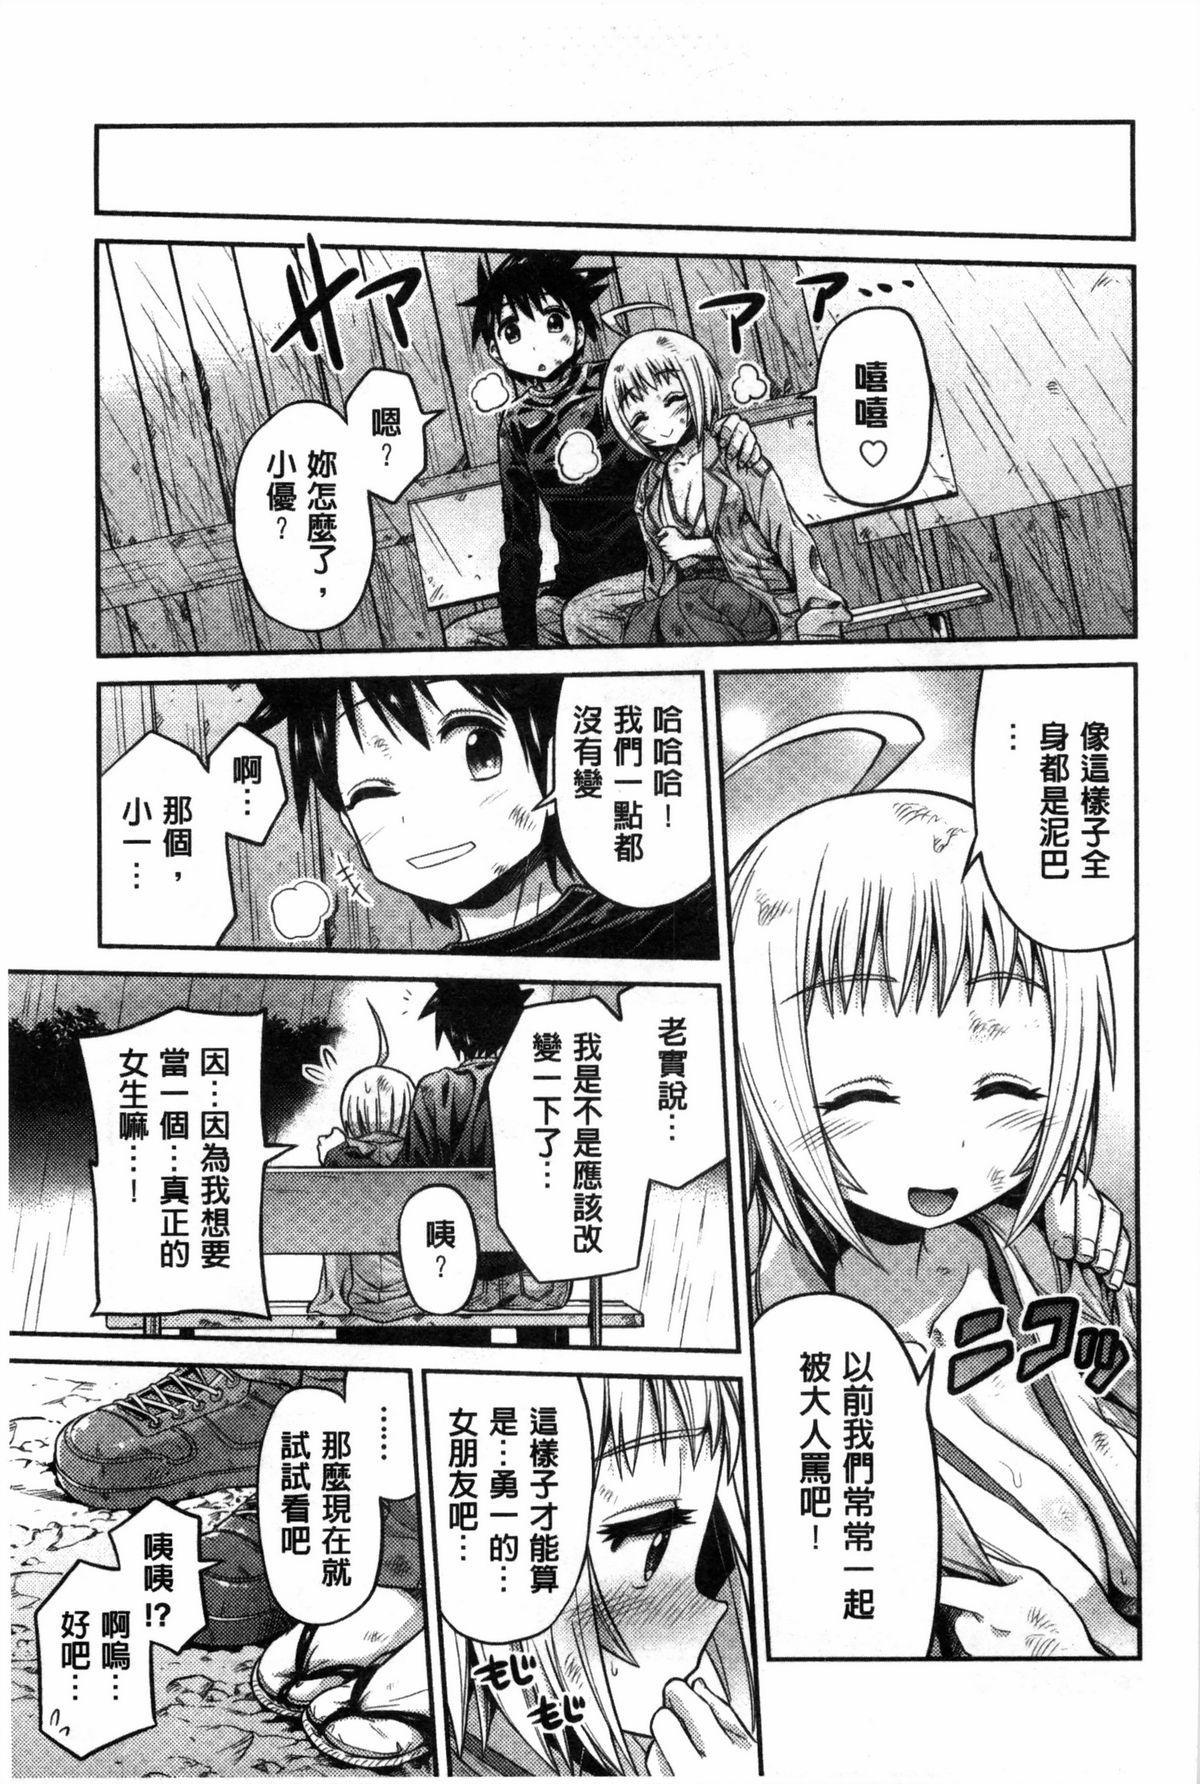 Man x Koi - Ero Manga de Hajimaru Koi no Plot   A漫×戀情 由情色漫畫所萌生的戀之物語 95